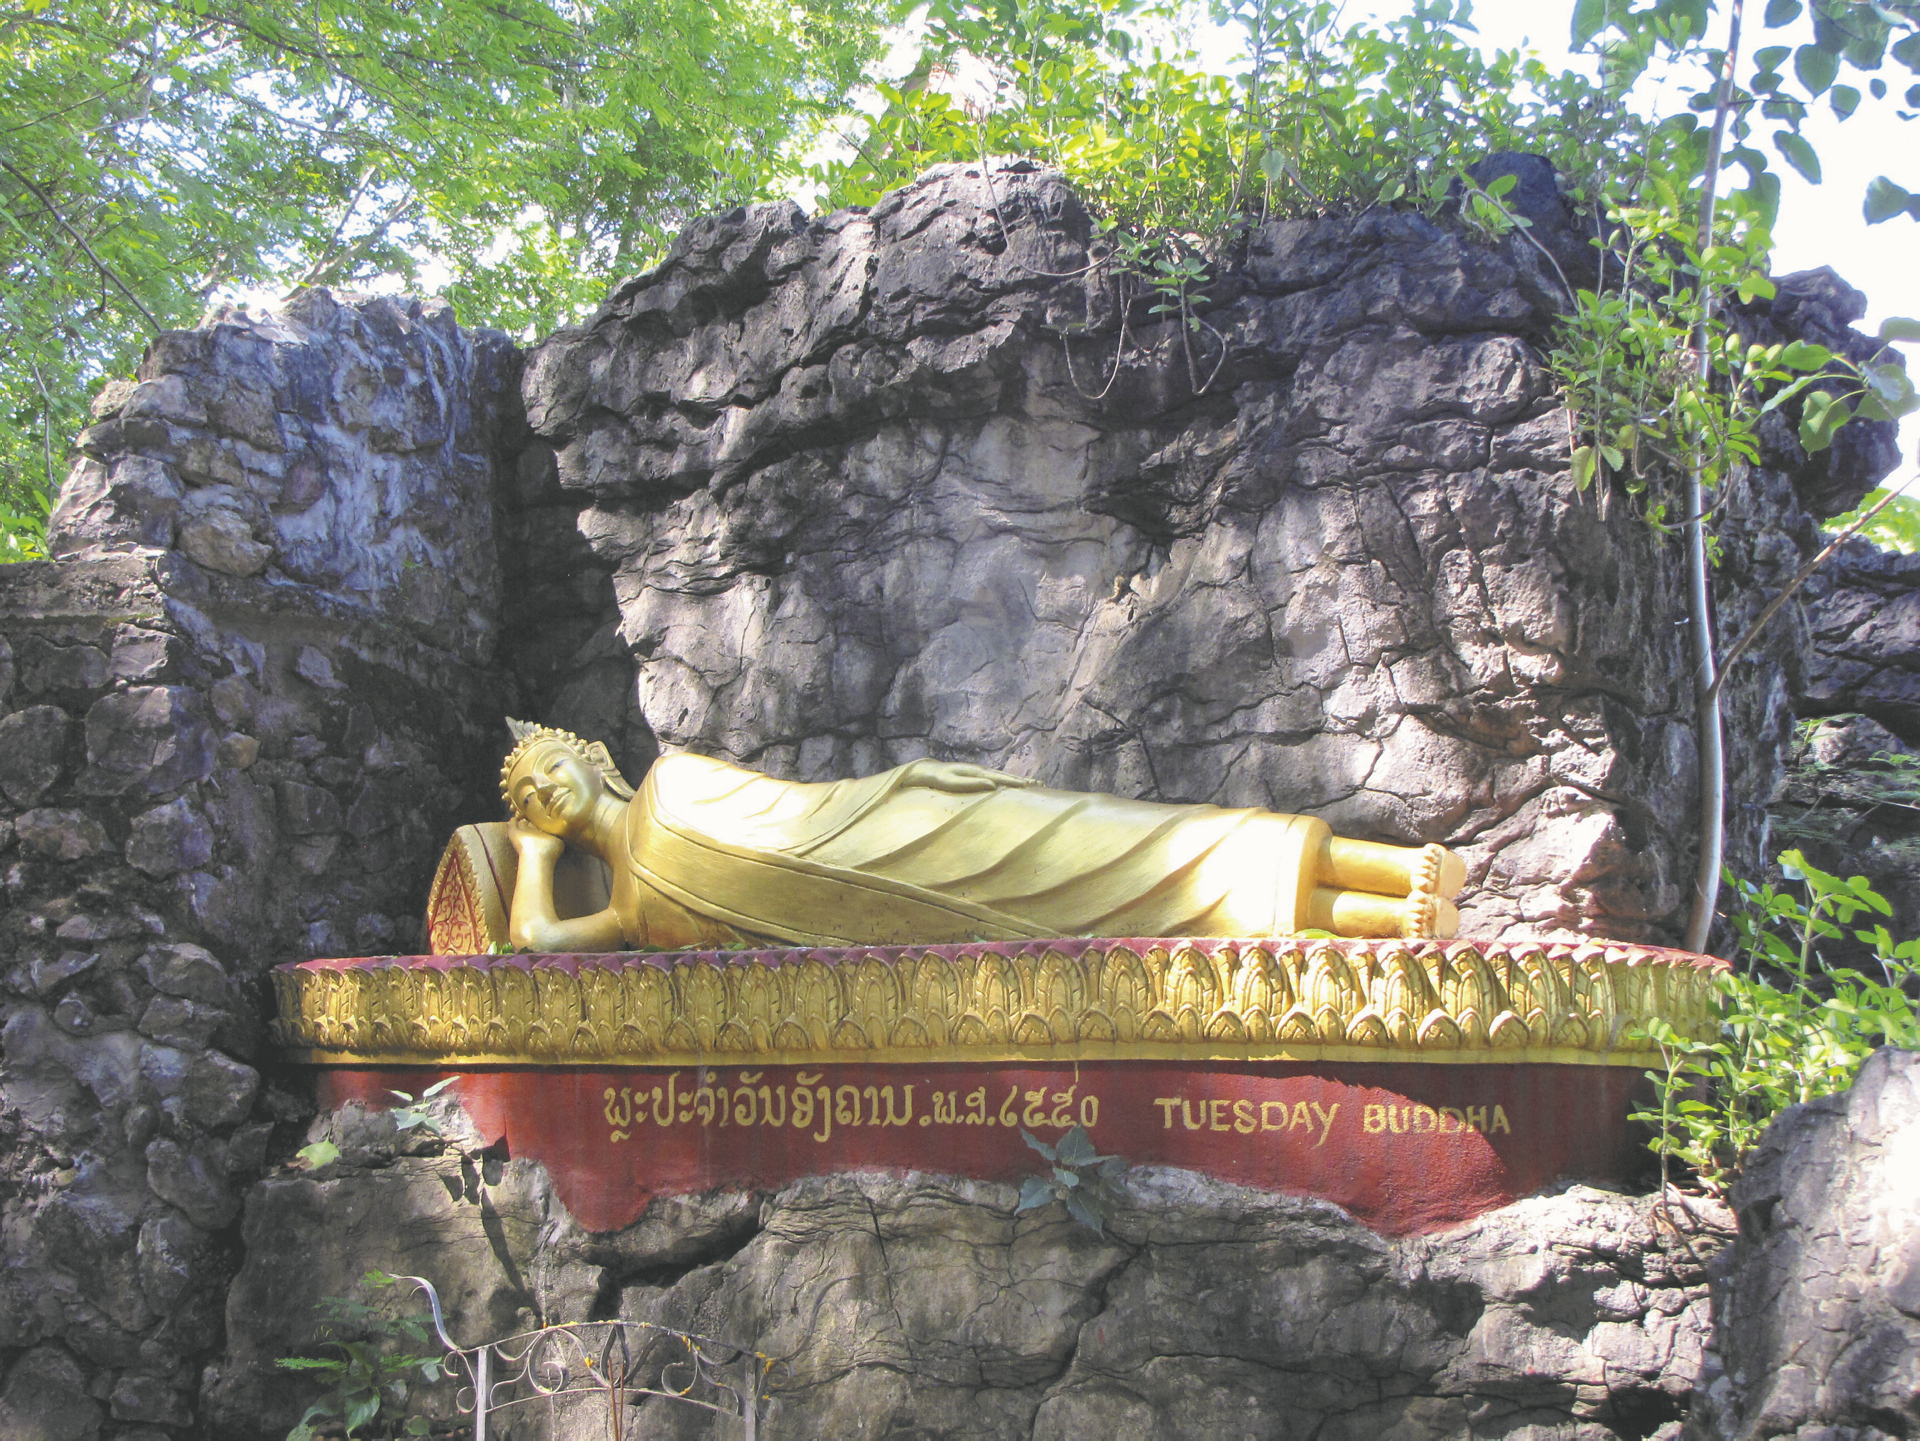 Buddha am Mt. Phousi, Luang Prabang